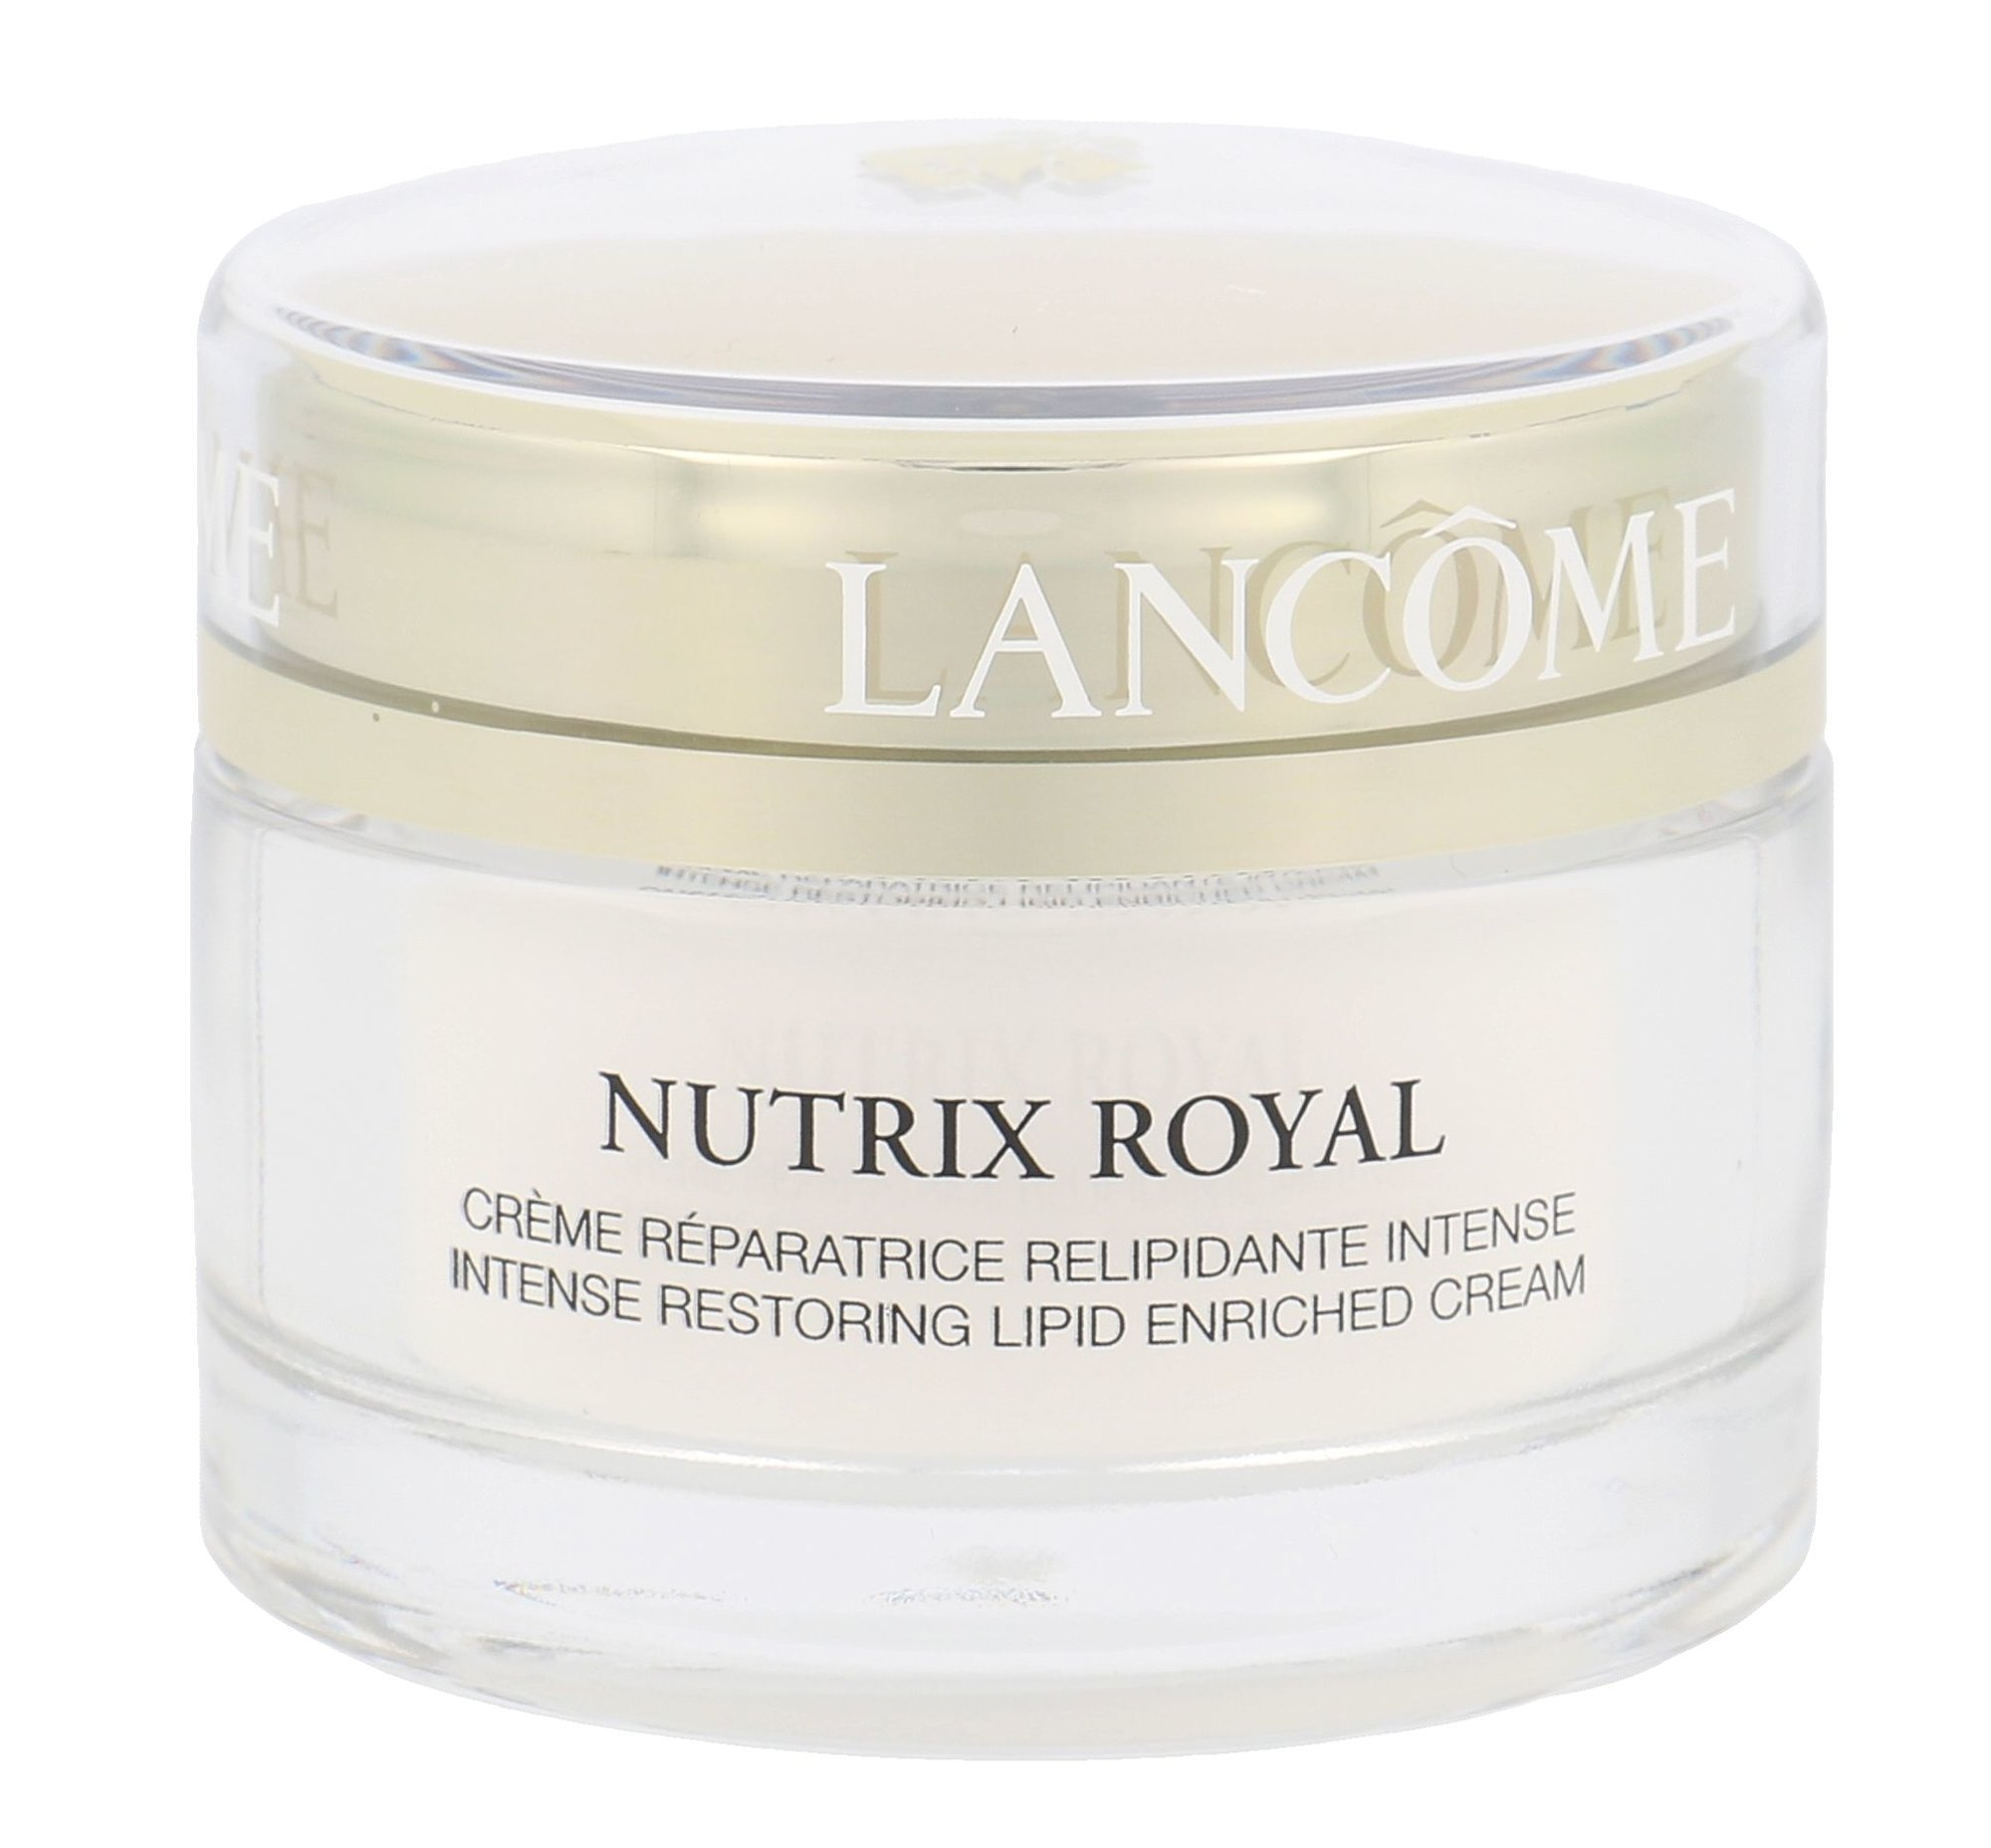 Lancôme Nutrix Royal Cosmetic 50ml